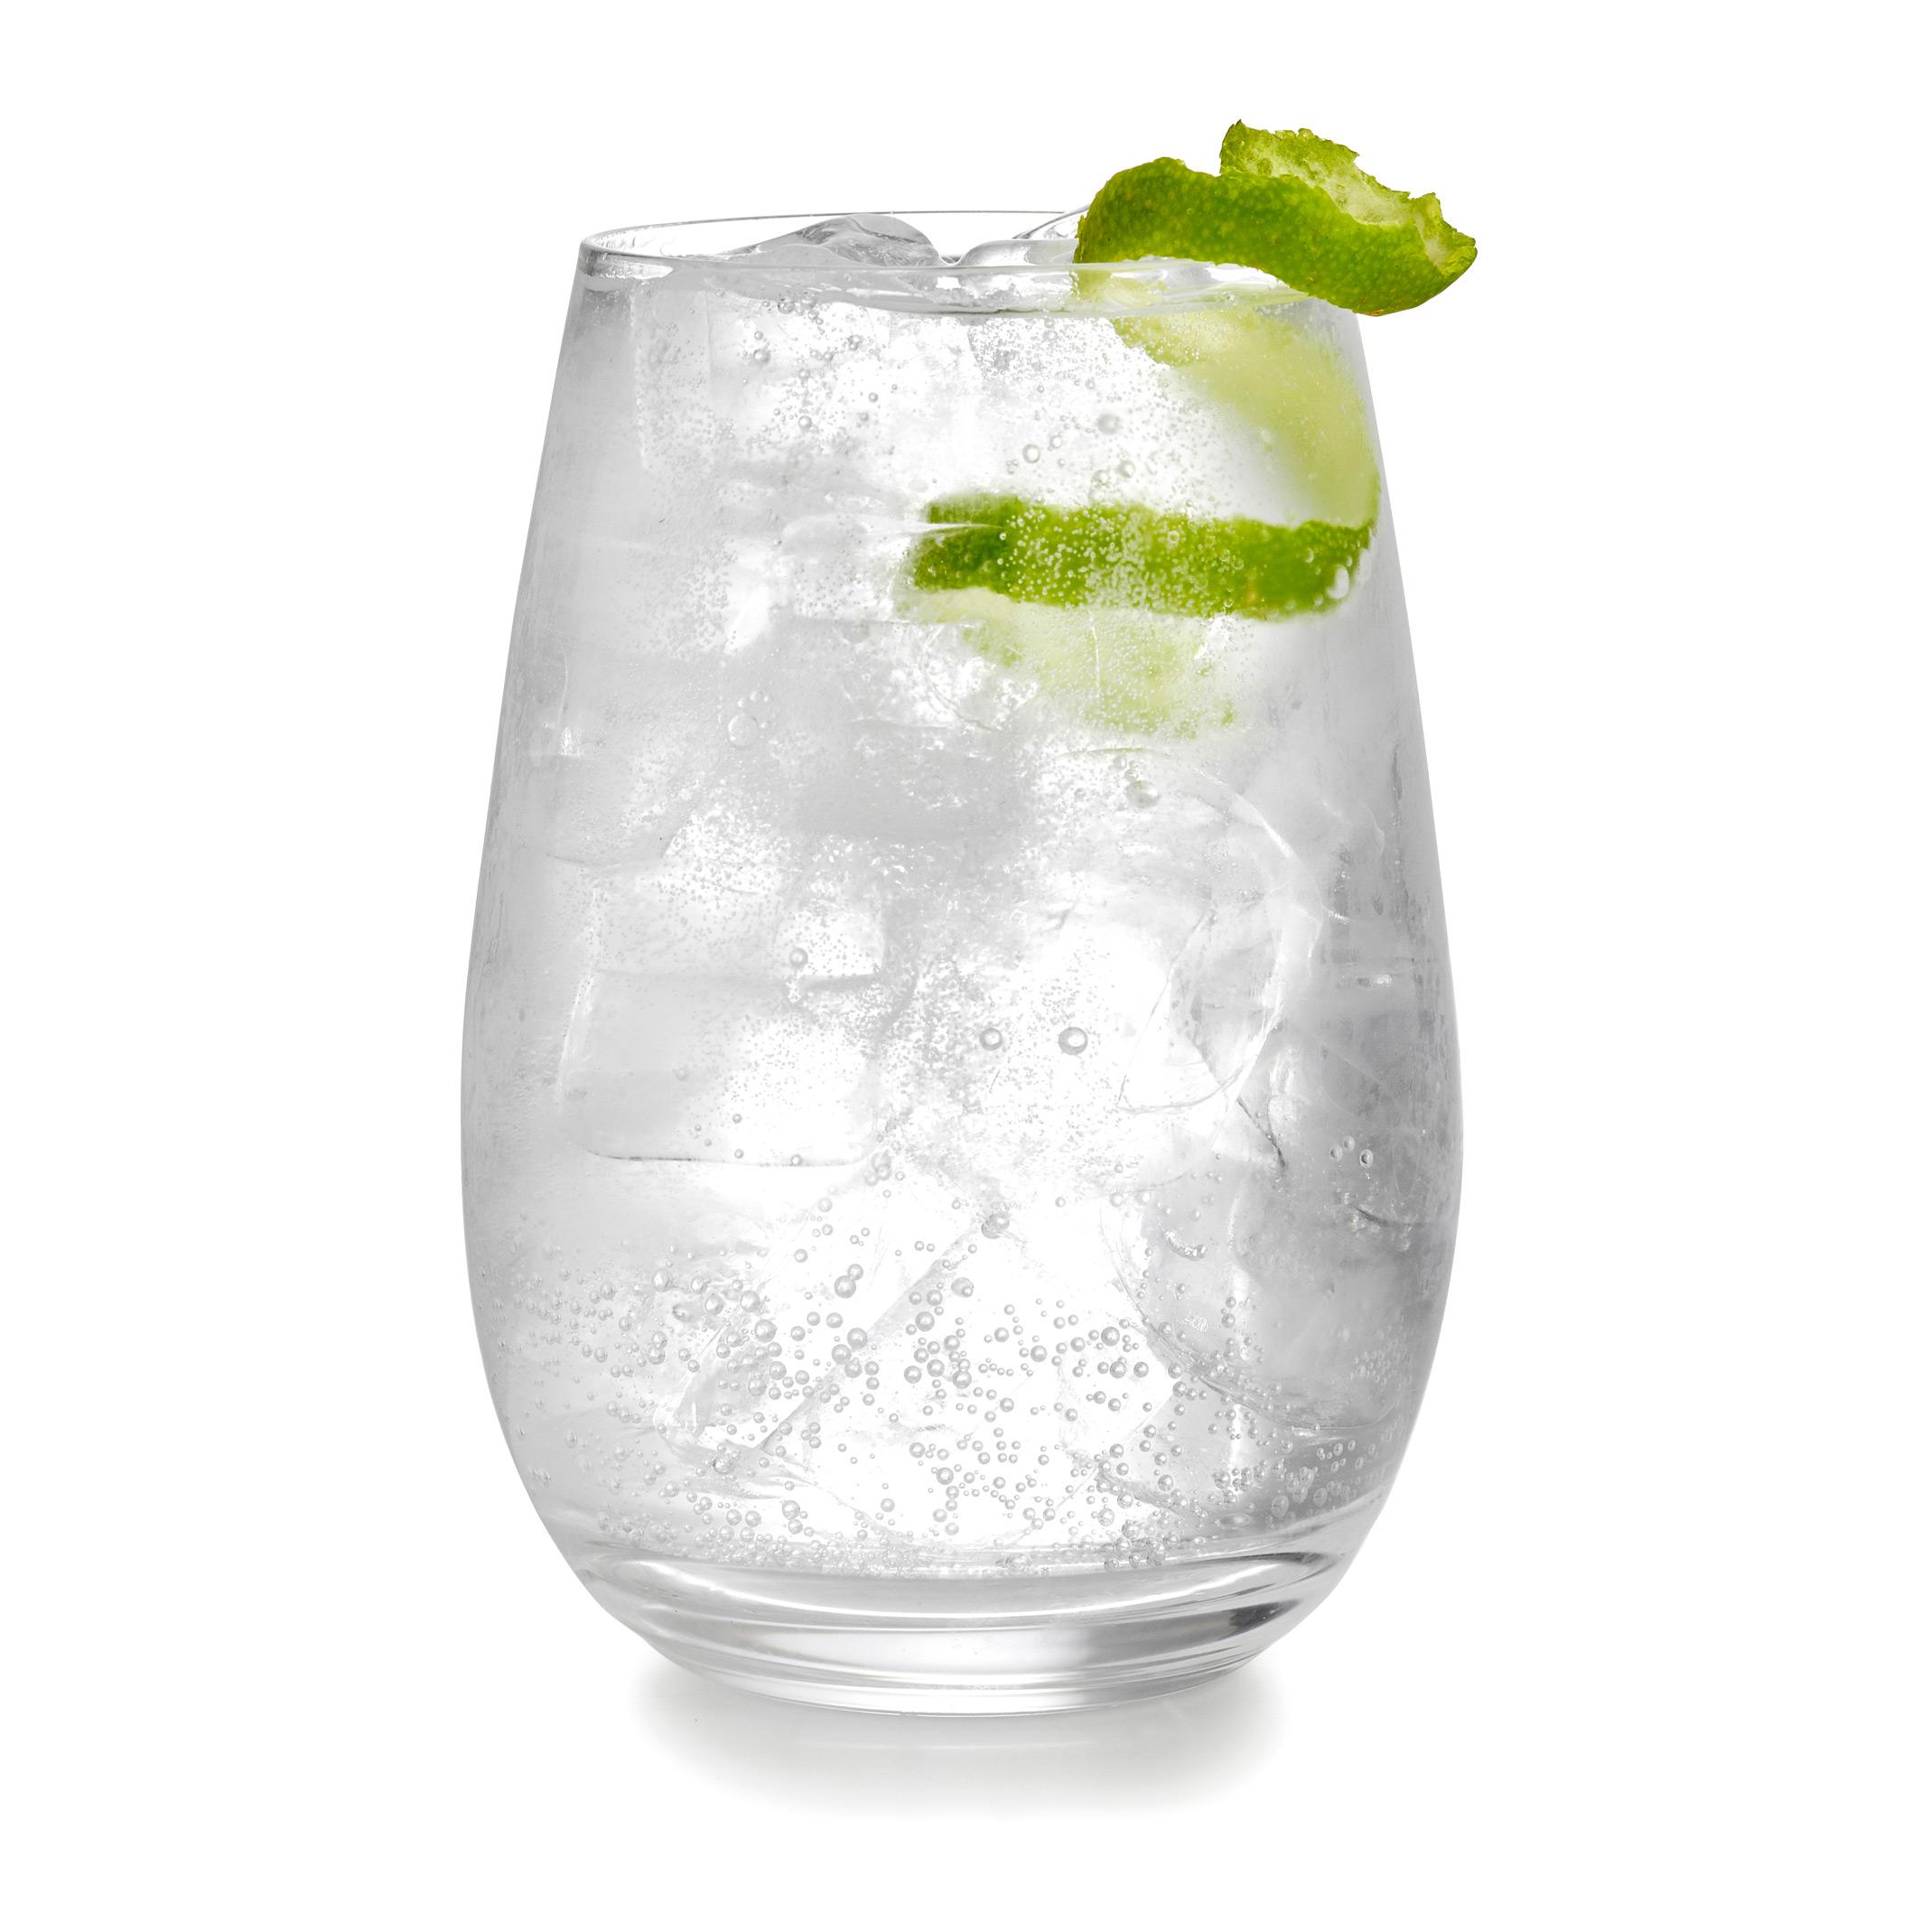 Gin-tonic-lime-packshot-drink-photography.jpg